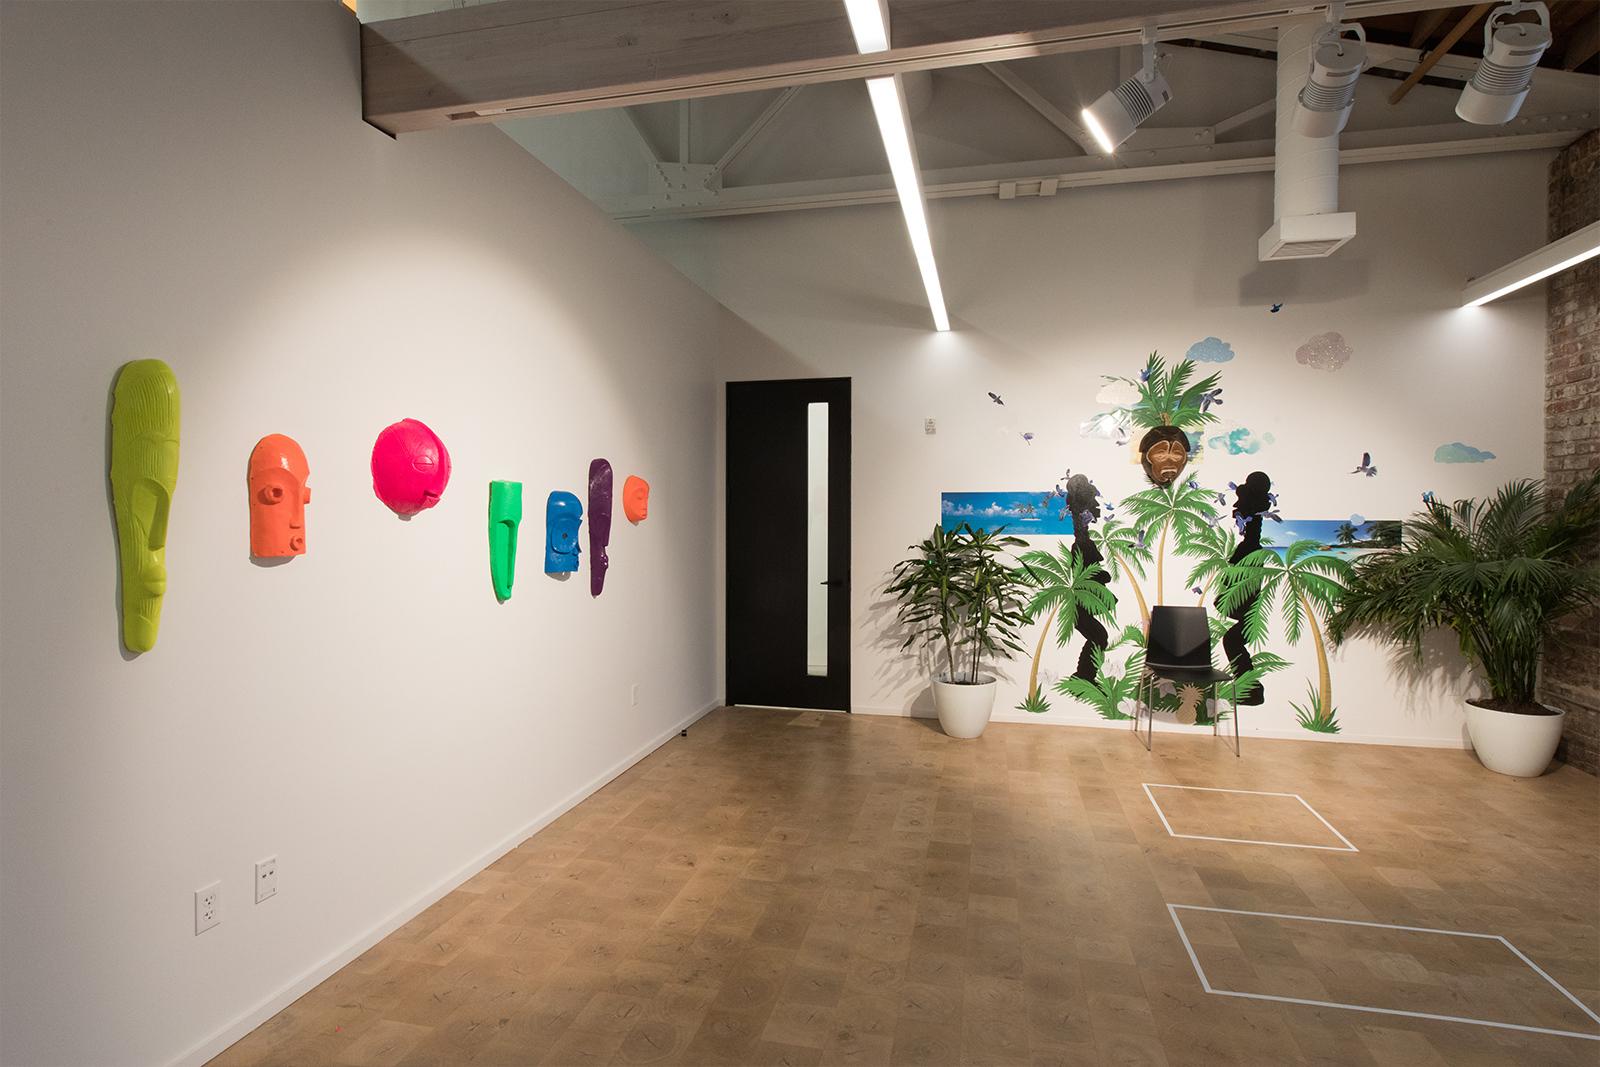 Union-gallery-zoecharlton28